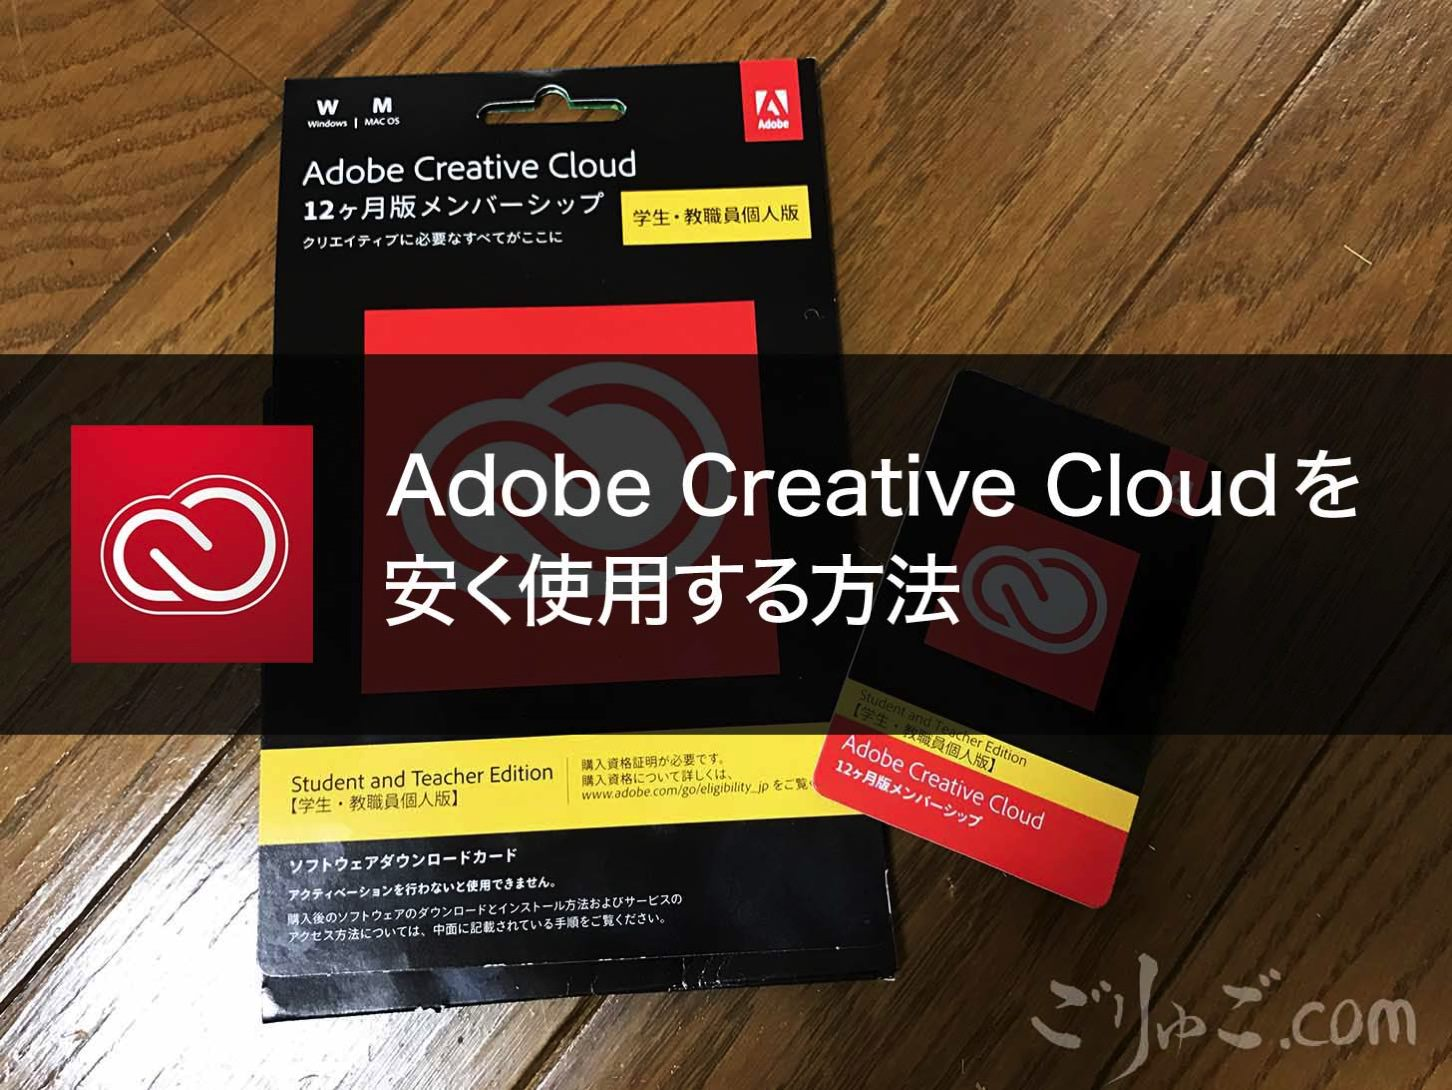 Adobe Creative Cloudを安く使用する方法